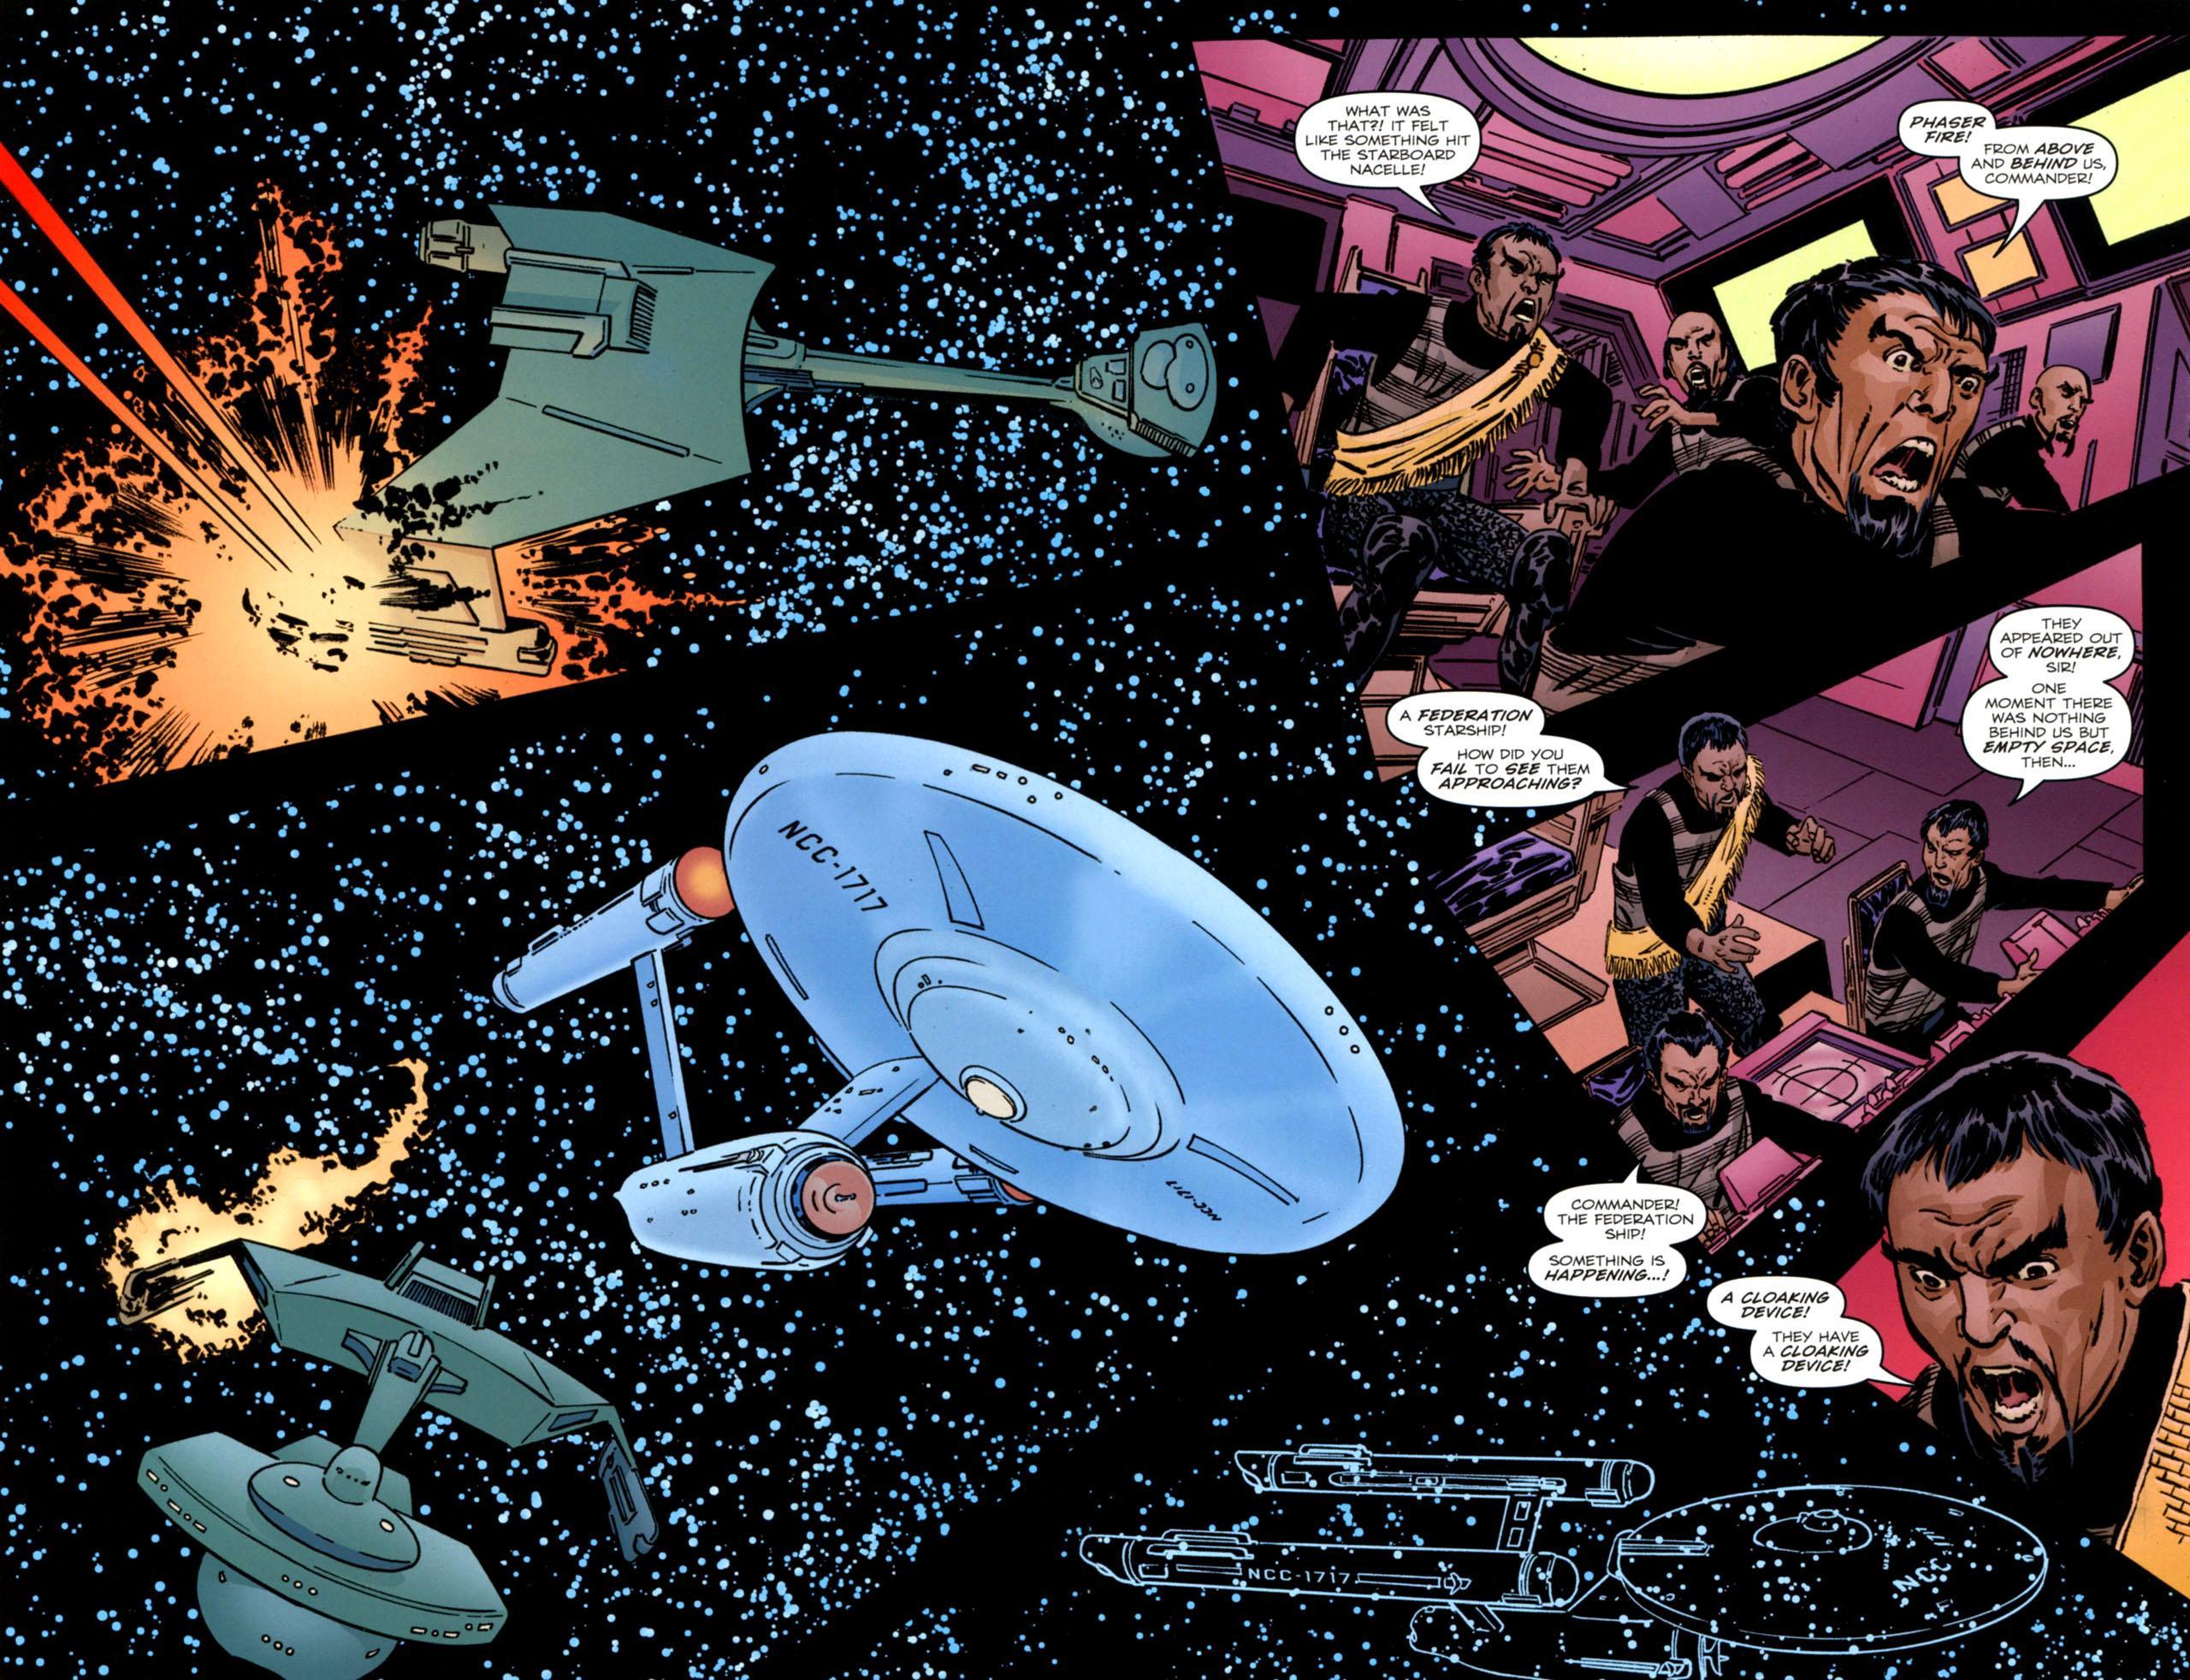 Star Trek Romulans Pawns of War review